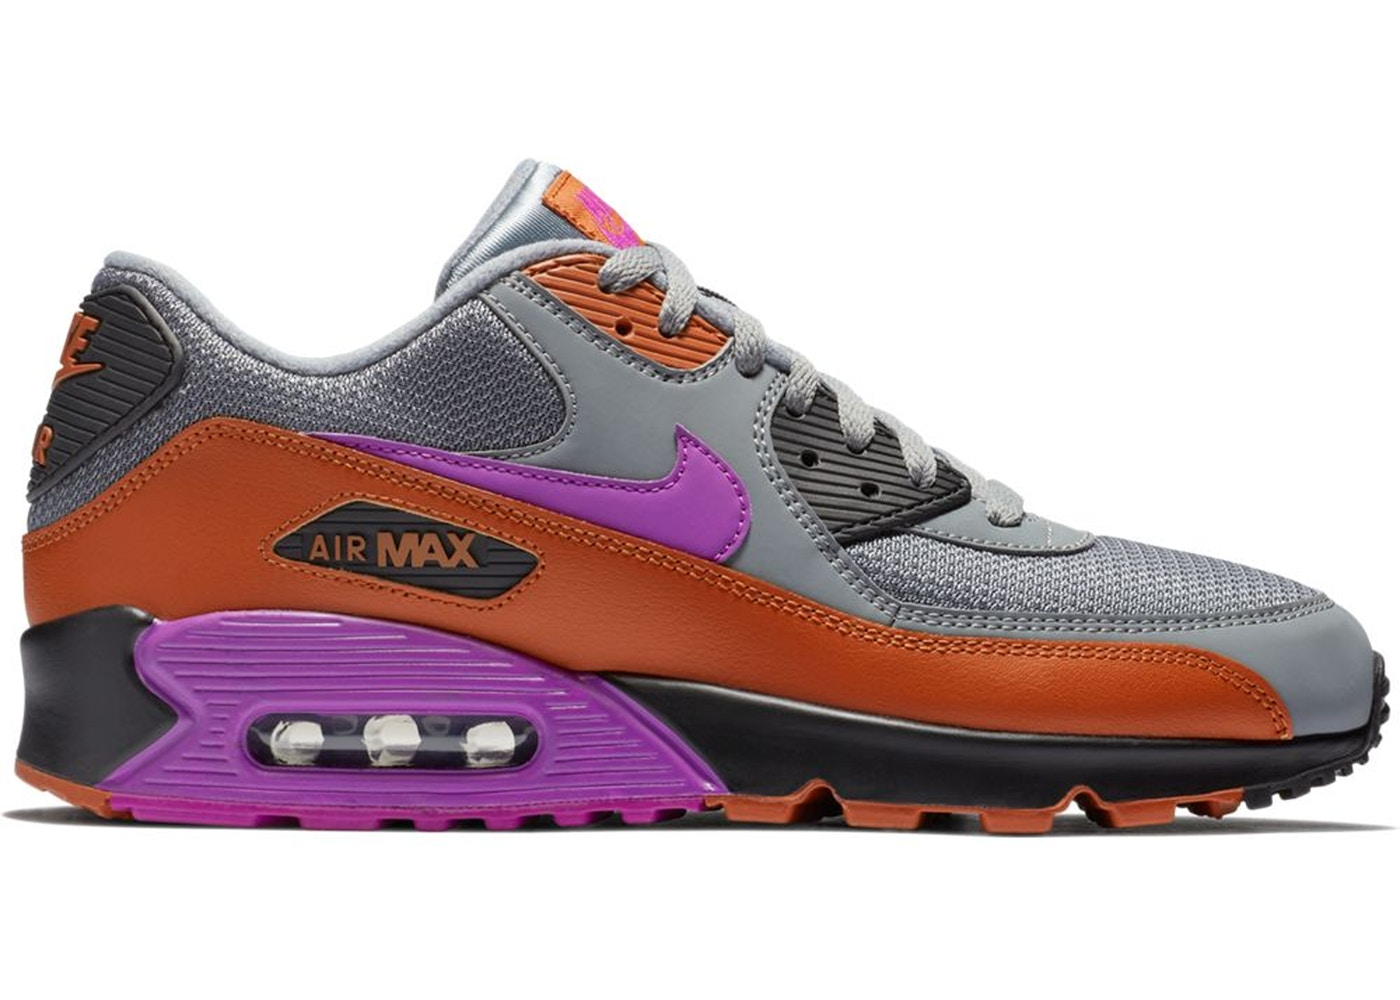 952a212beff5 Nike Air Max 90 Shoes - New Highest Bids